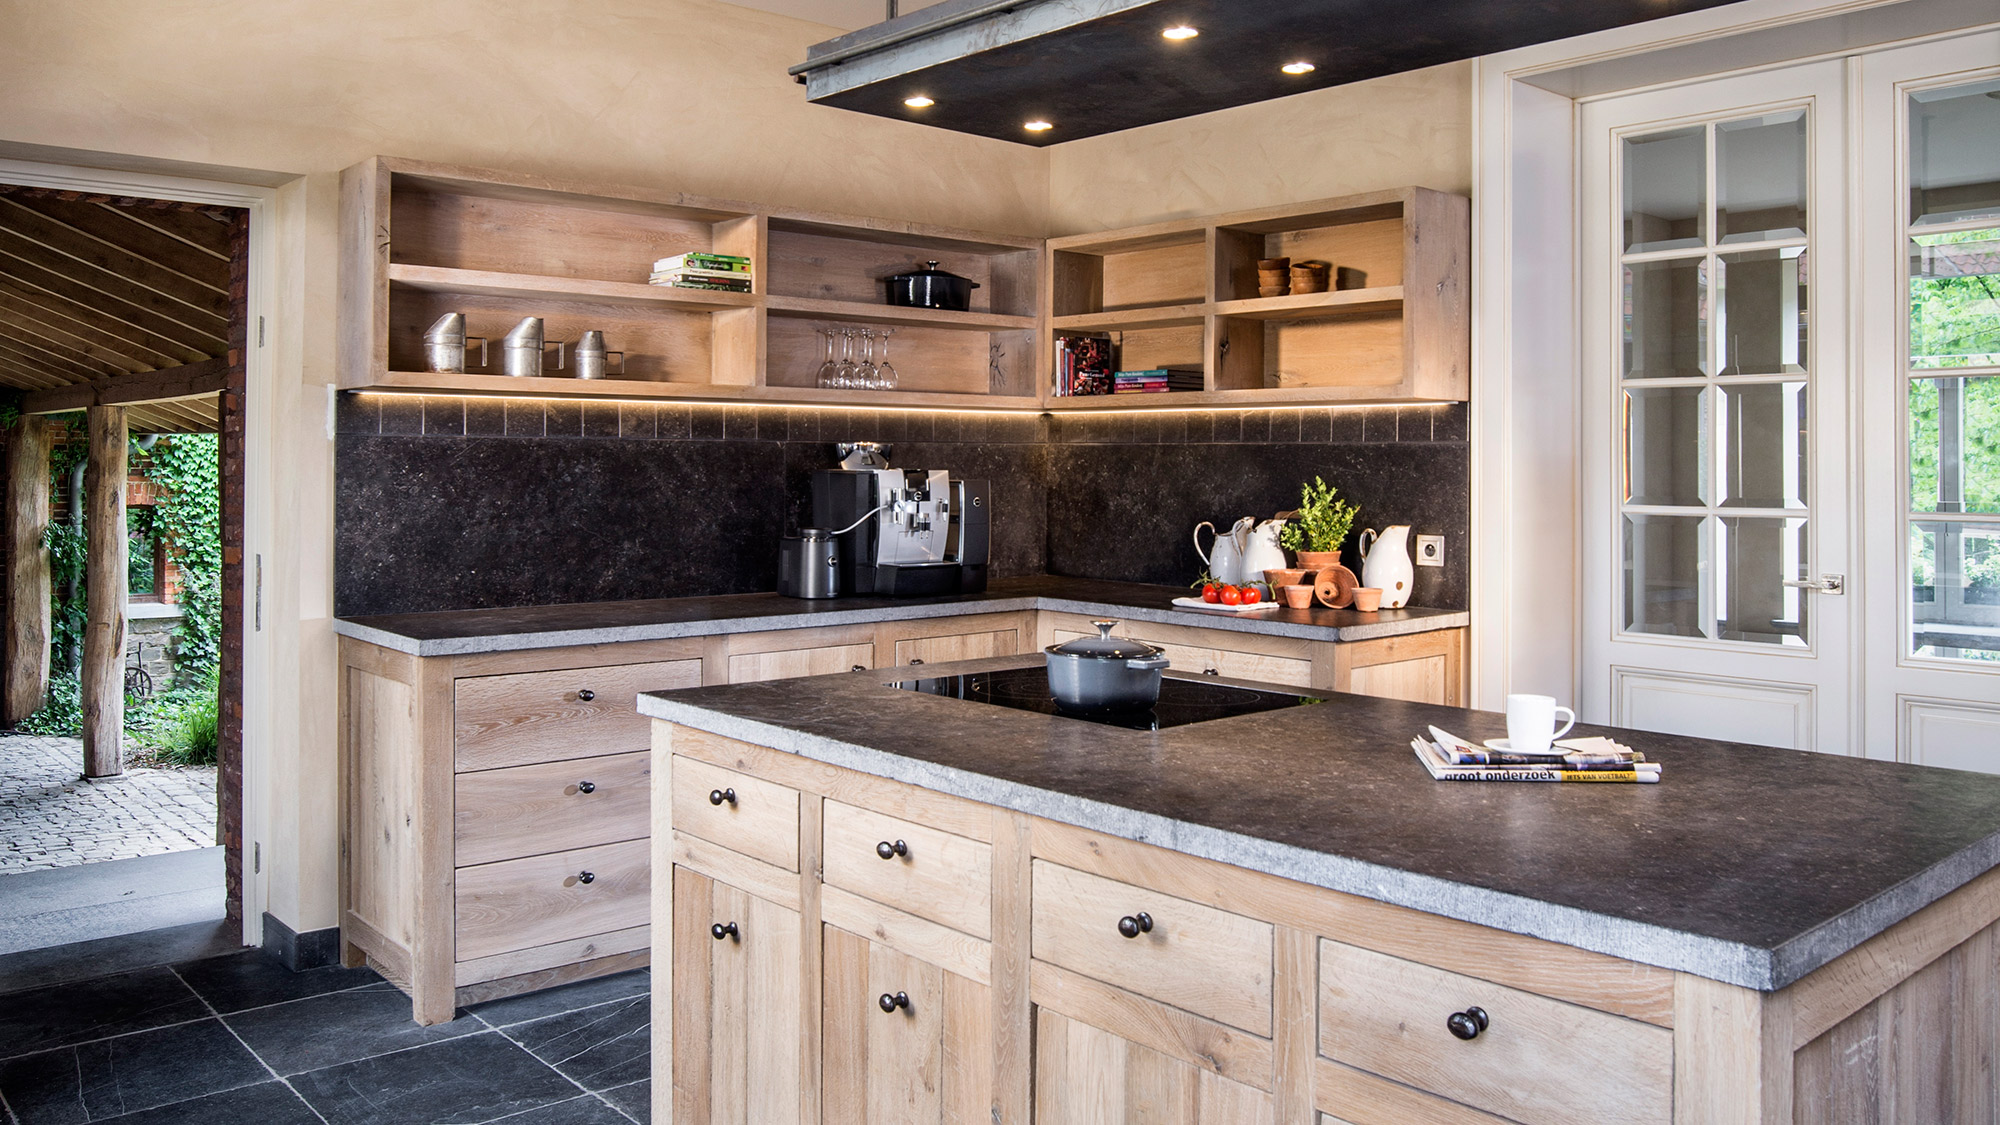 cuisine bois massif sur mesure. Black Bedroom Furniture Sets. Home Design Ideas